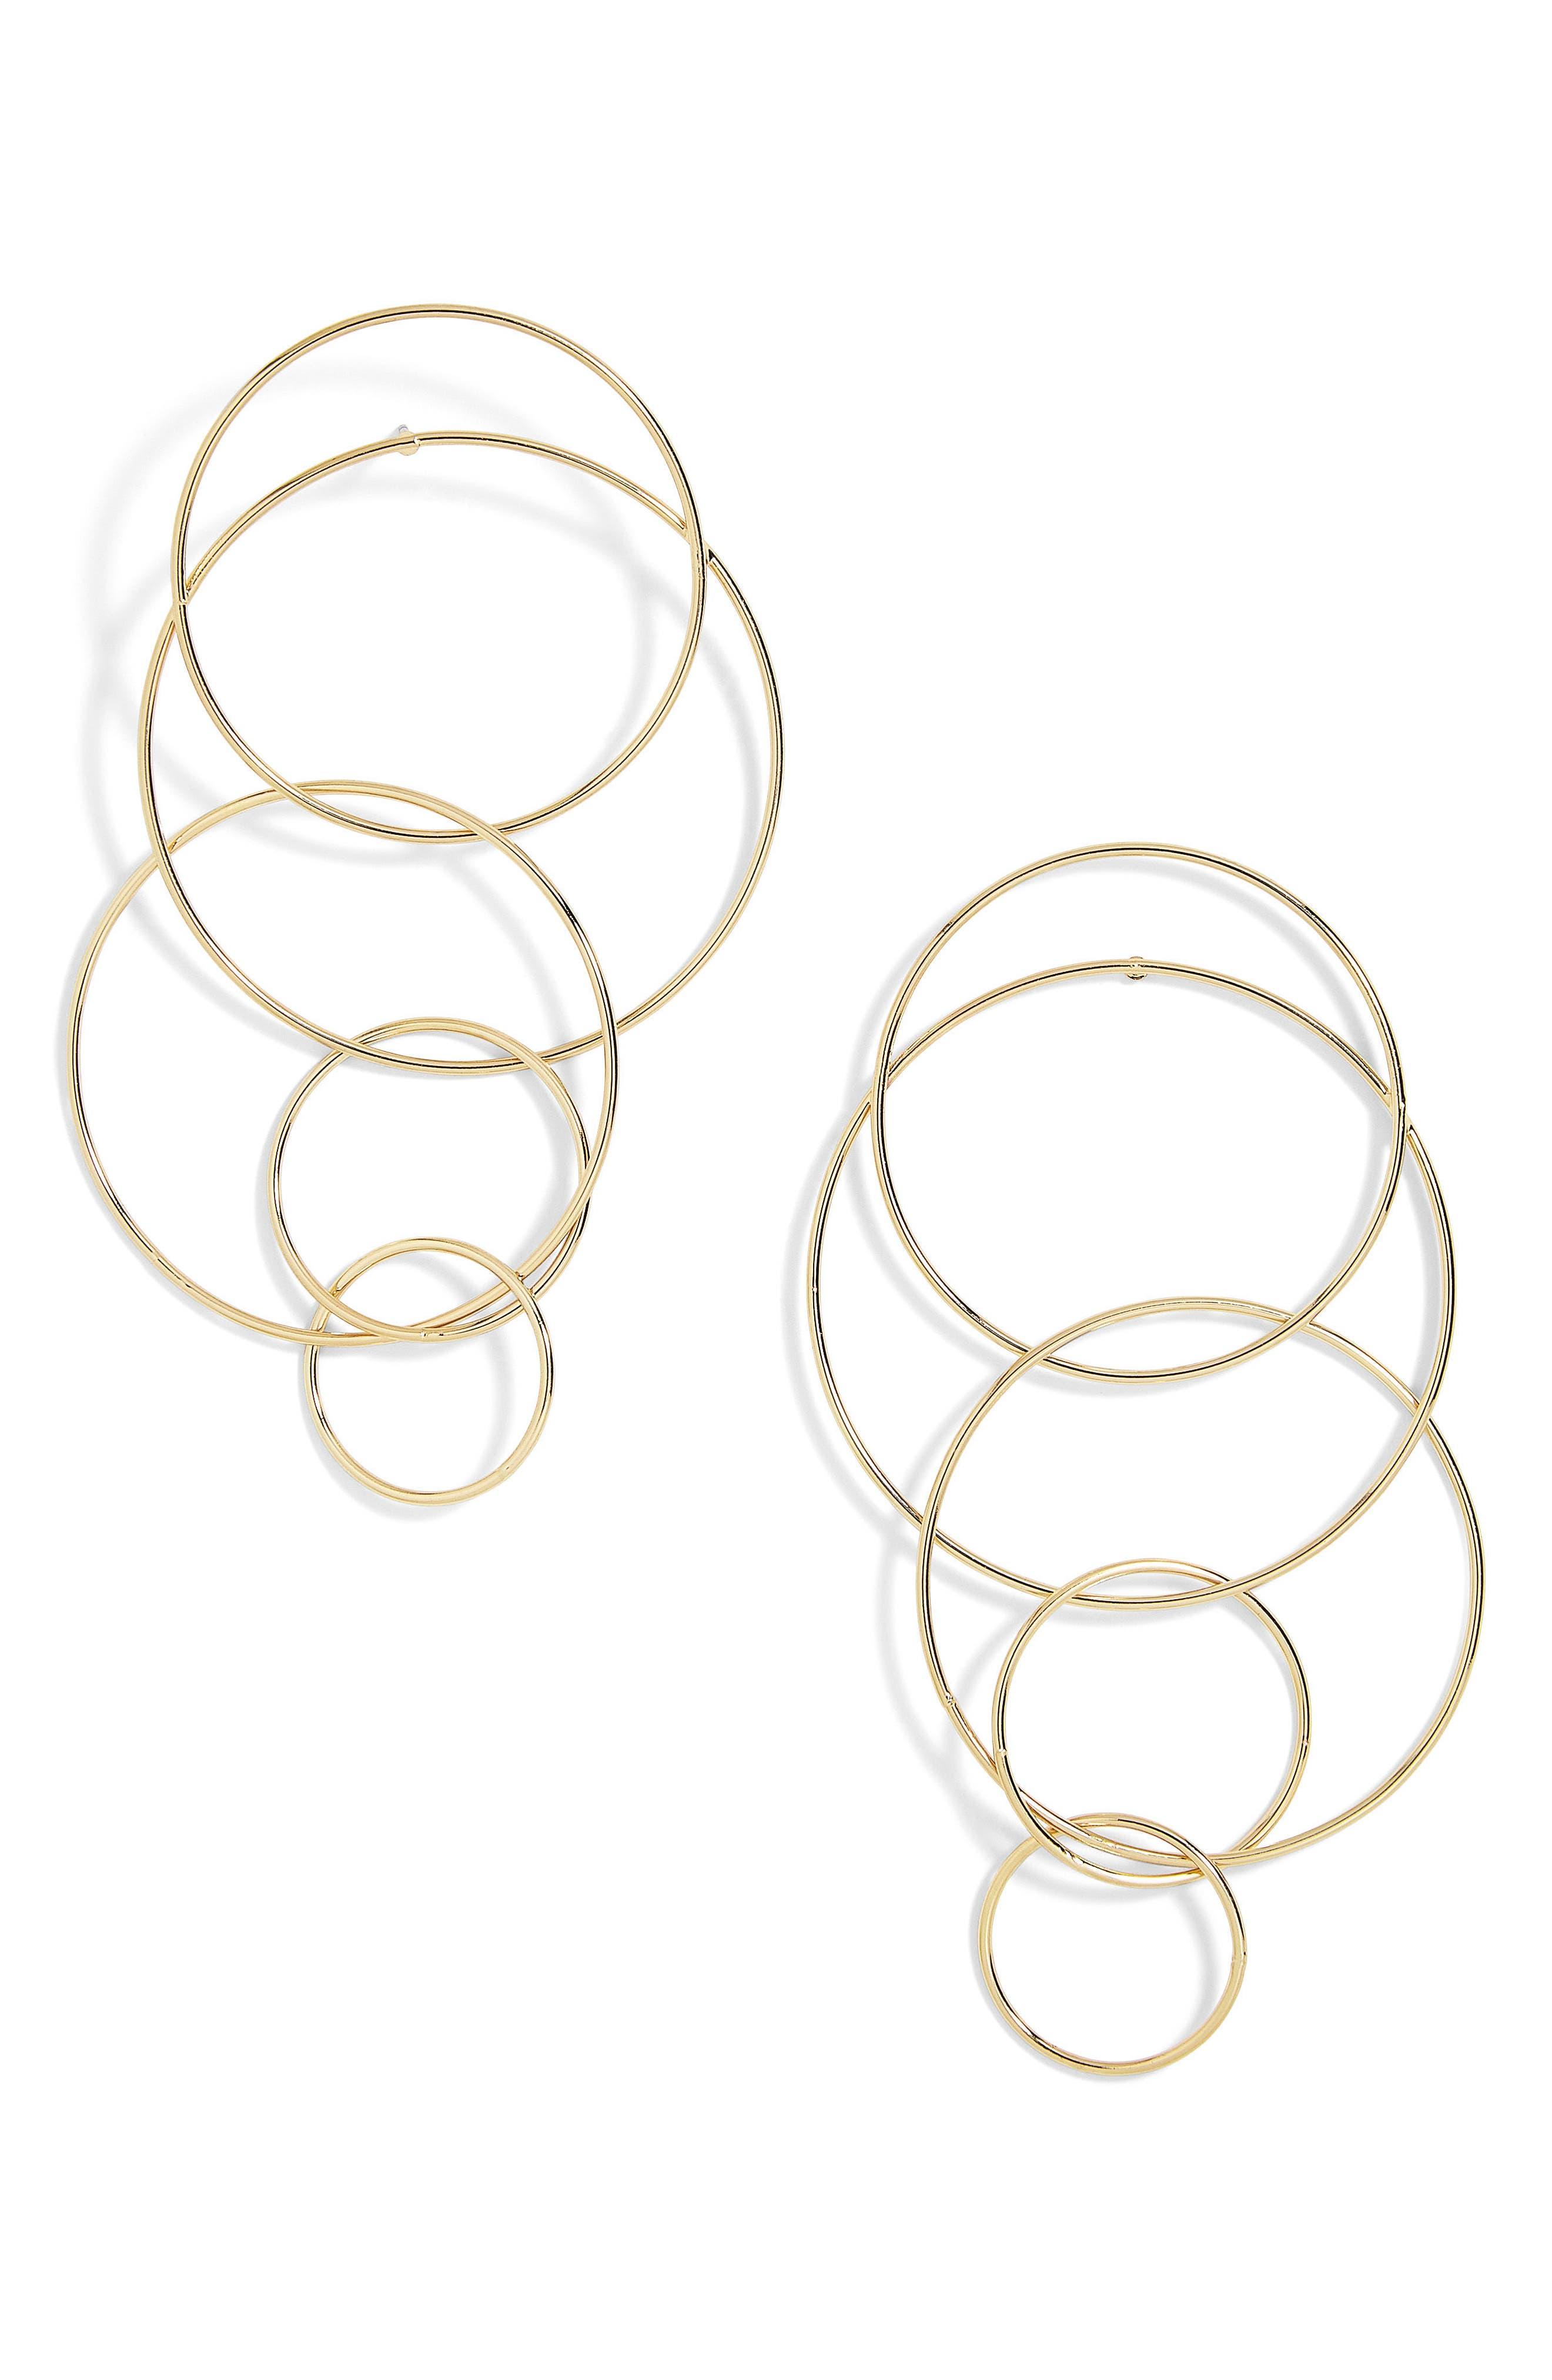 Mixed Size Layered Hoop Earrings,                             Main thumbnail 1, color,                             710